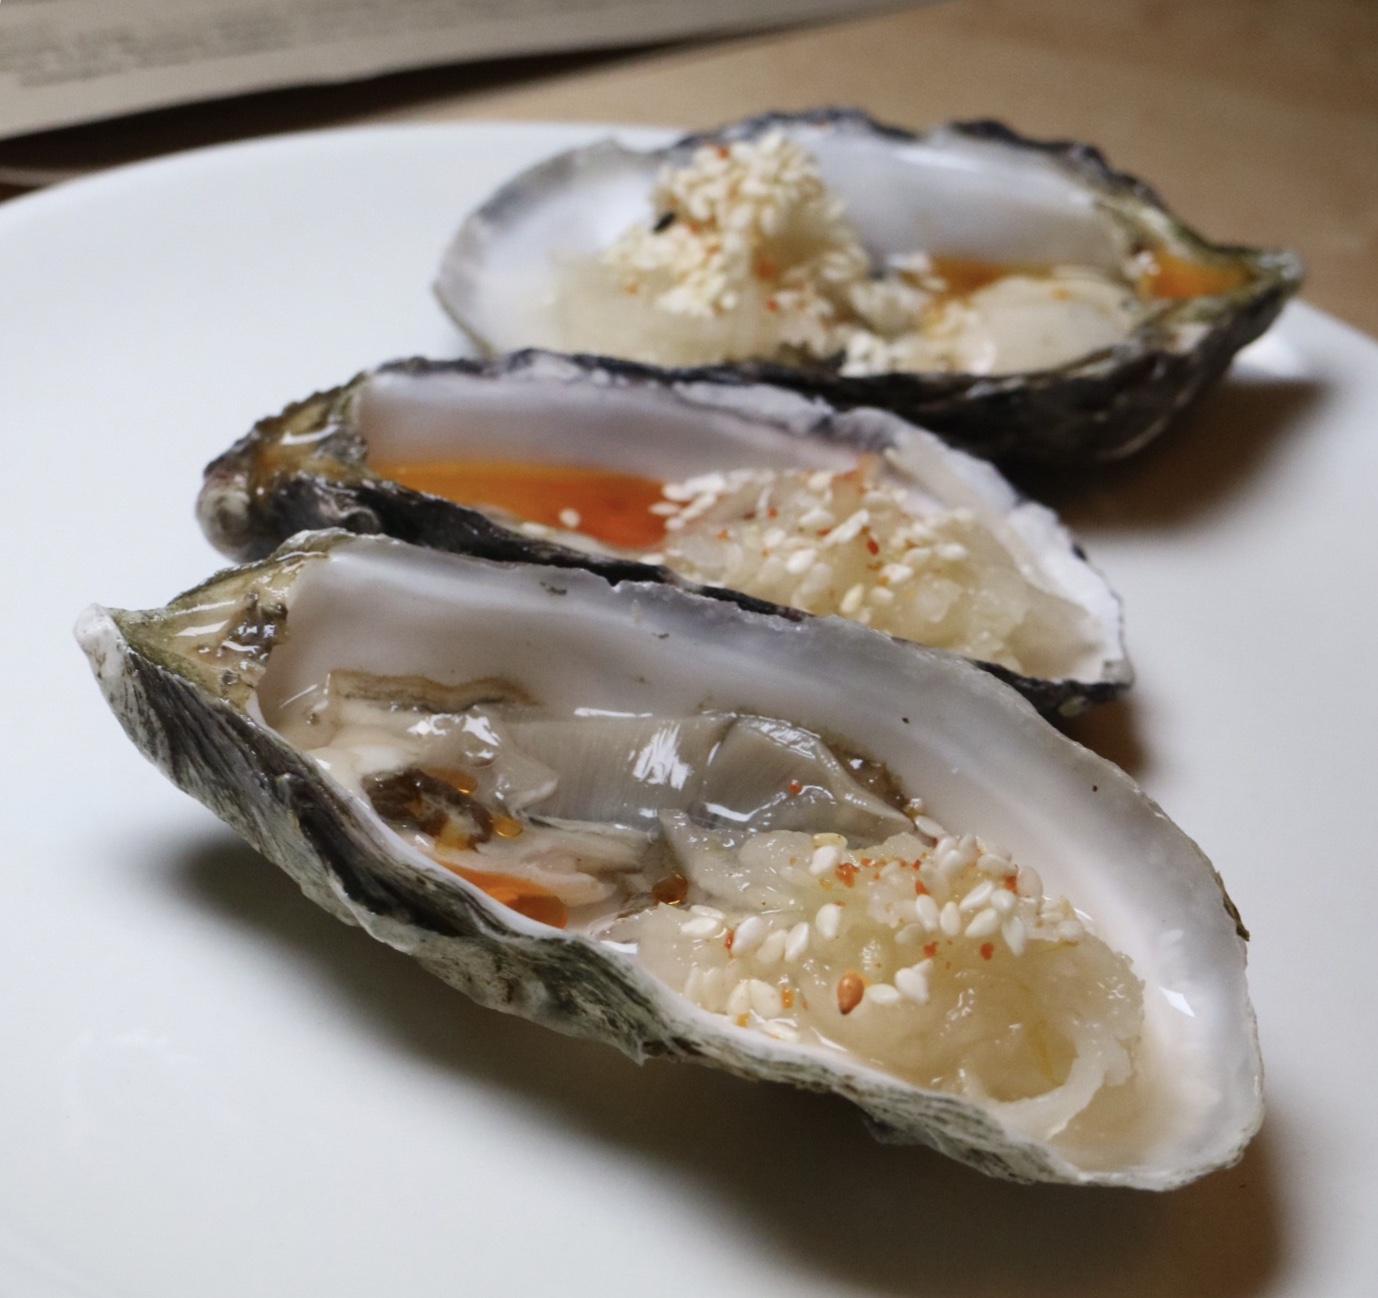 hog island sweetwater oysters with kohlrabi kraut & sesame